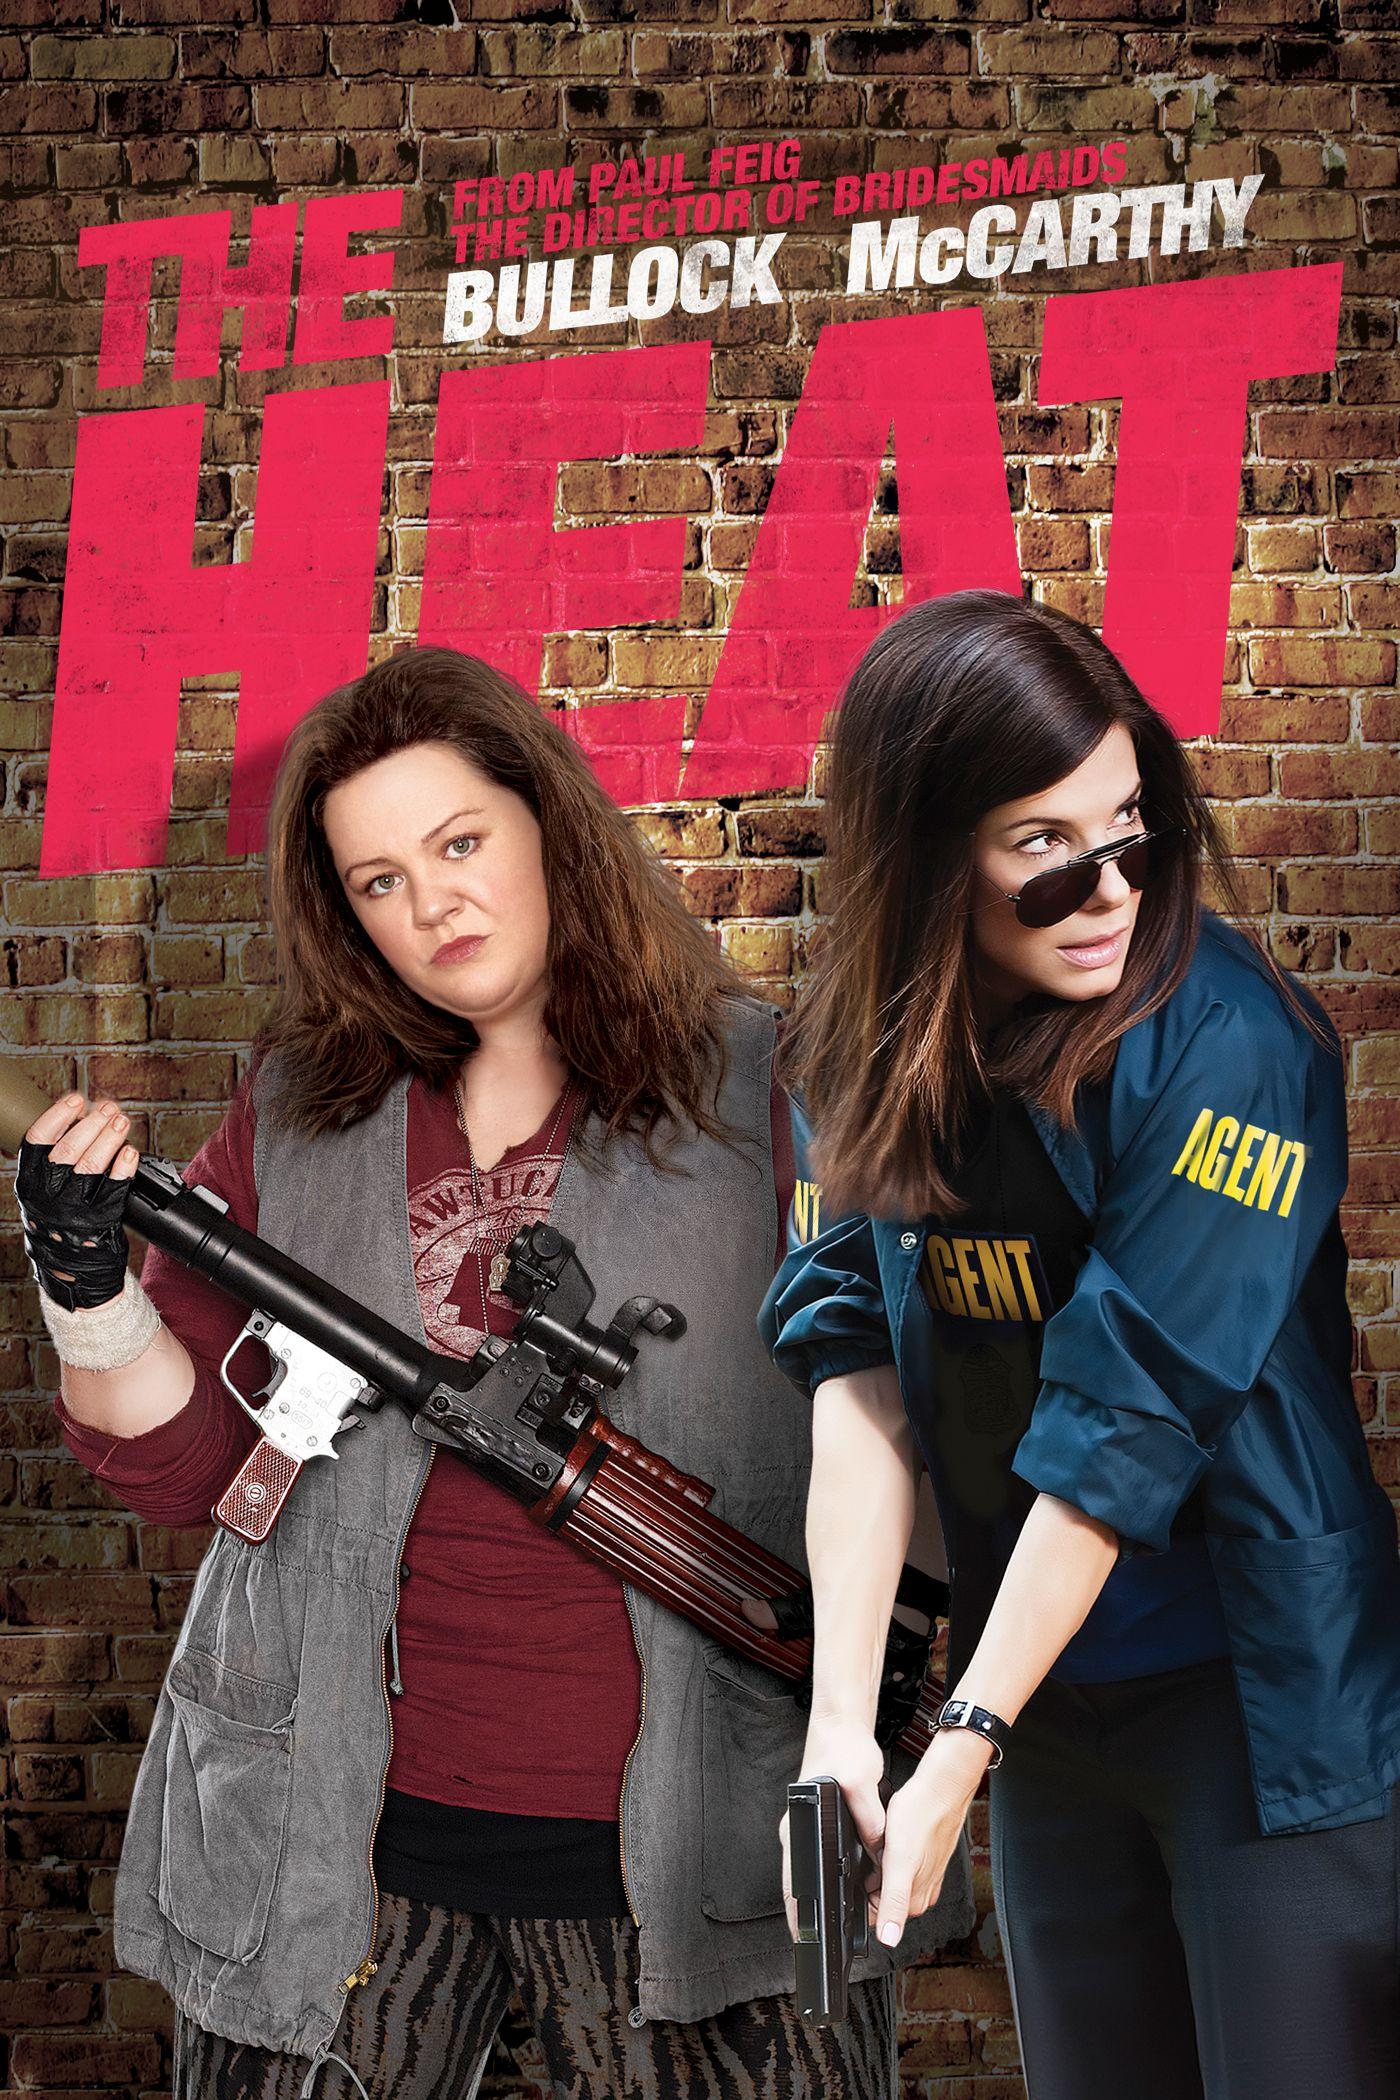 The Heat Full Movie